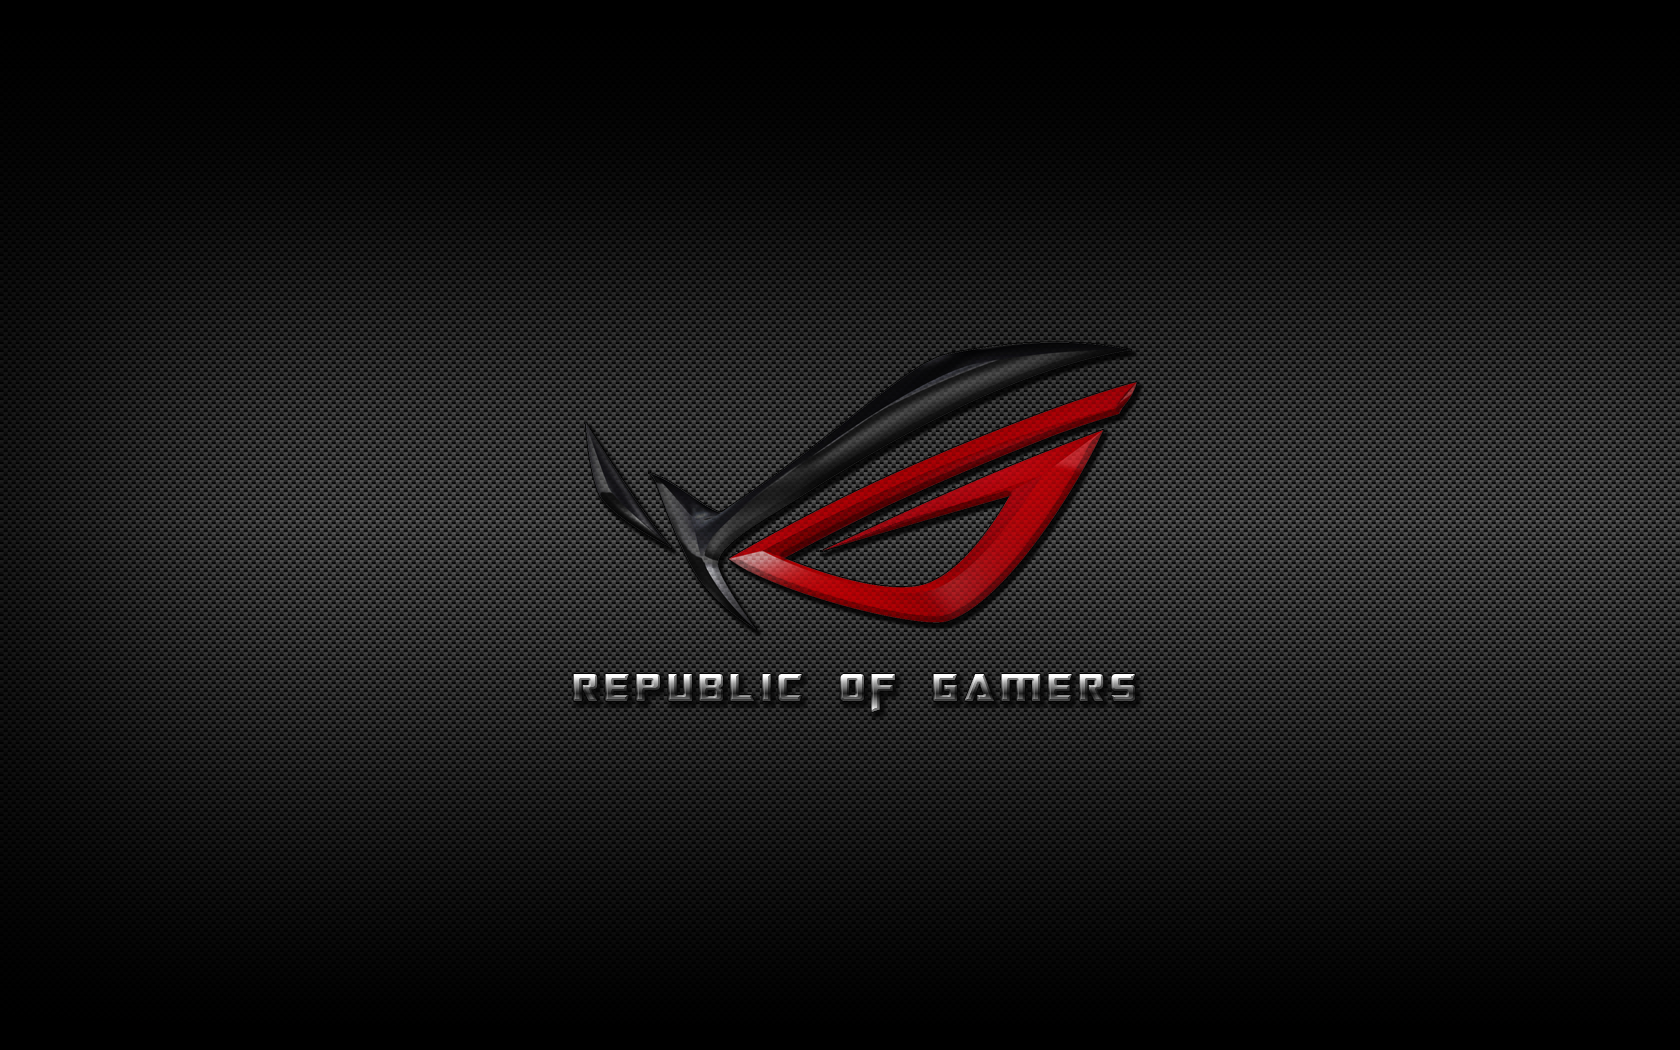 Asus Wallpapers Widescreen: ASUS ROG Republic Of Gamers Carbon Fiber By PeLu85 On